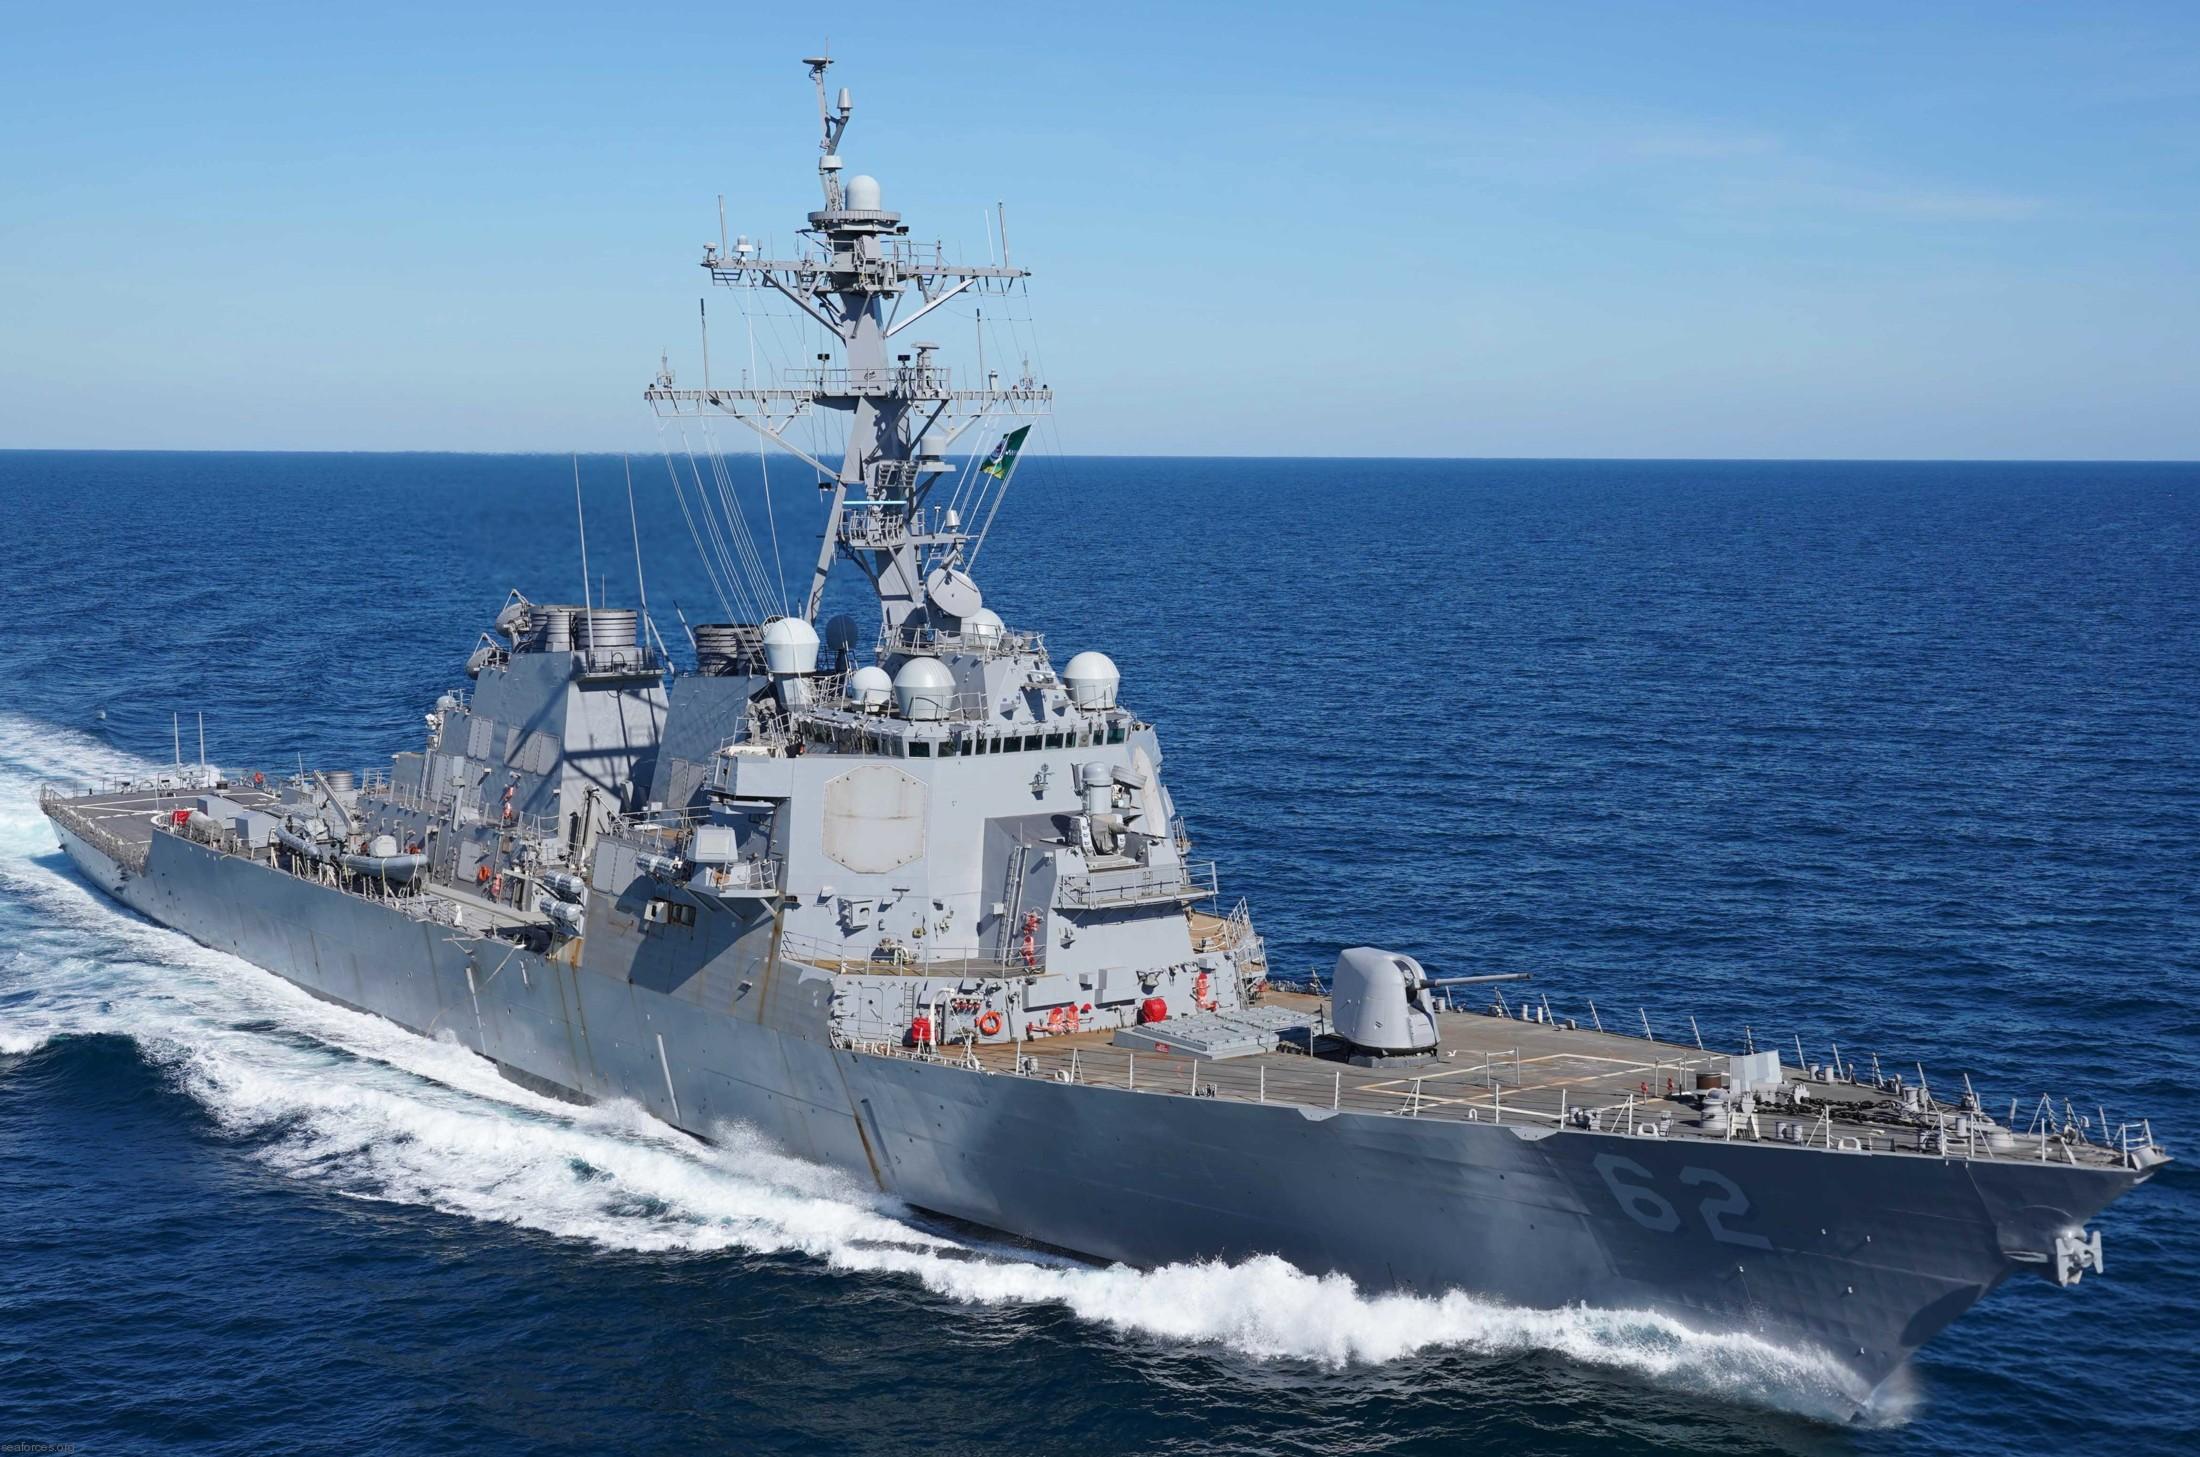 USS FITZGERALD DDG-62 HAT USN NAVY SHIP ARLEIGH BURKE CLASS DESTROYER COLLISION